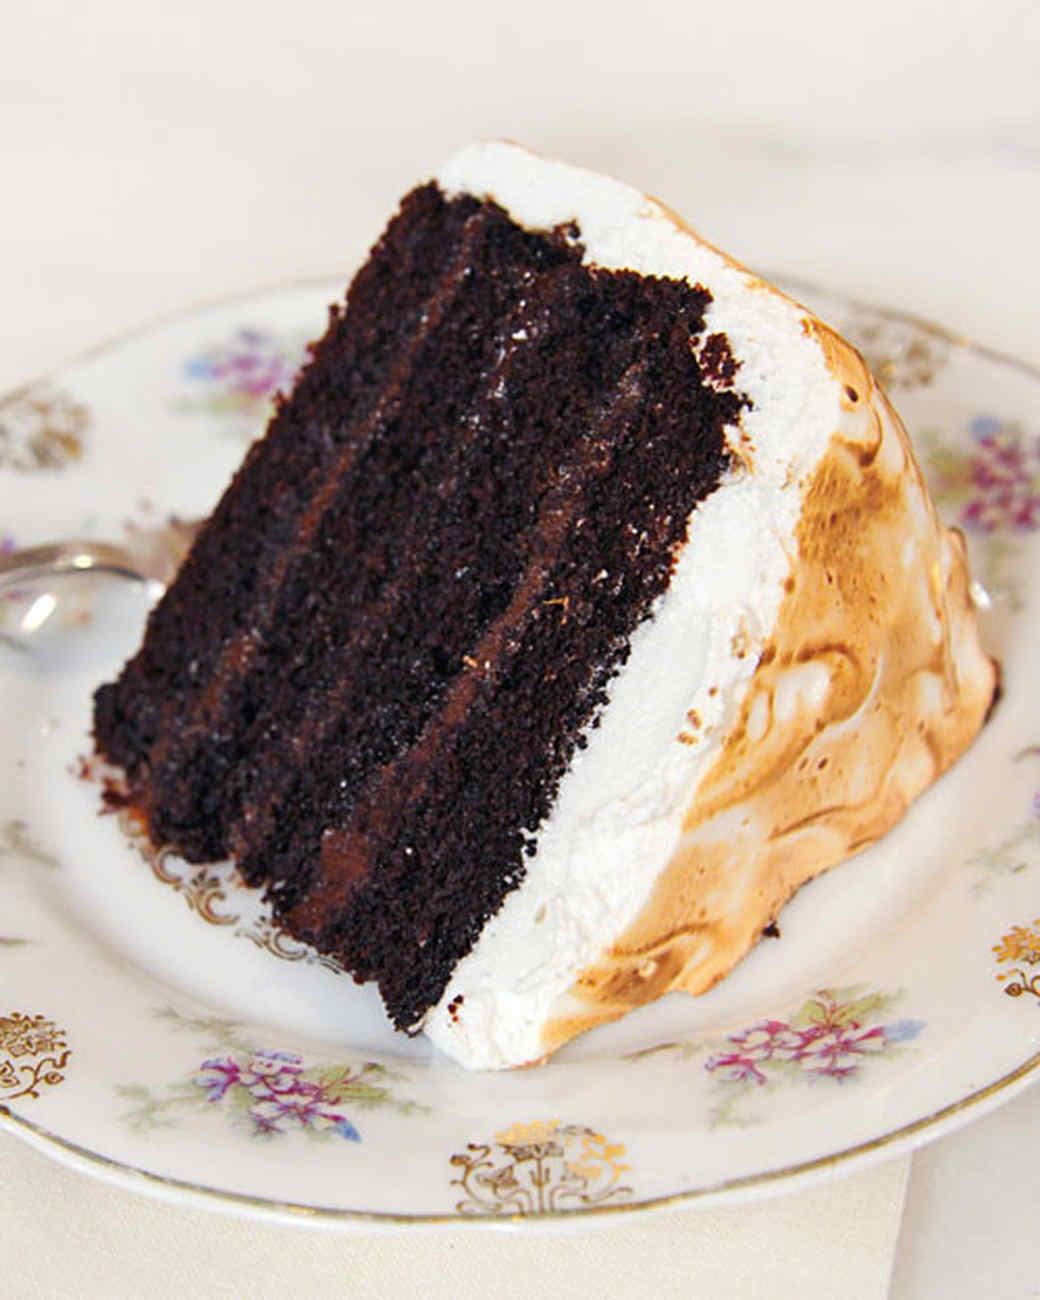 6097_020811_cake.jpg